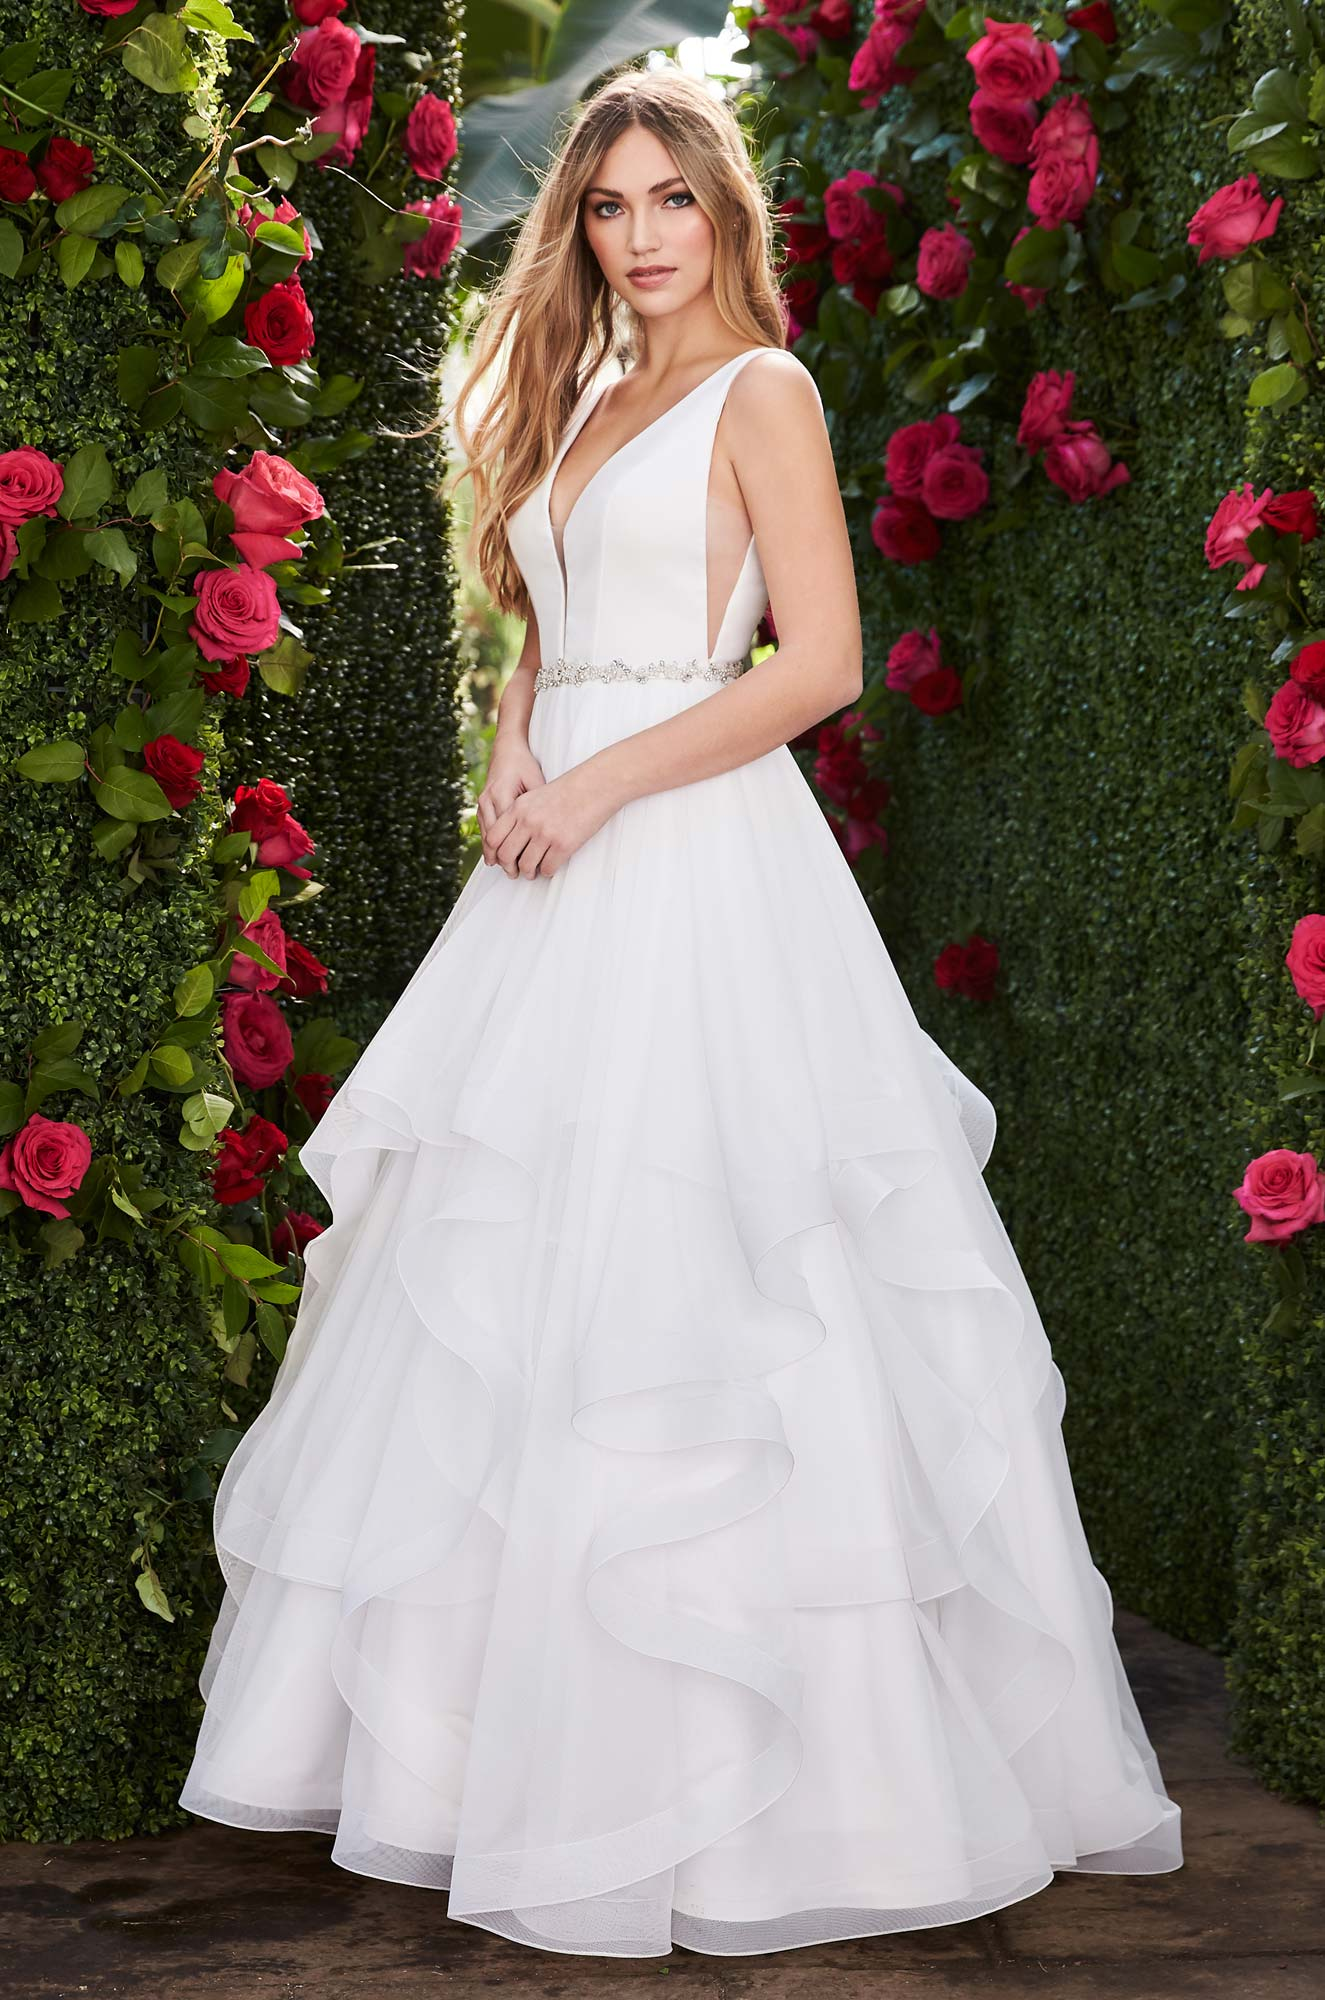 Layered Side Cut Wedding Dress – Style #2255 | Mikaella Bridal